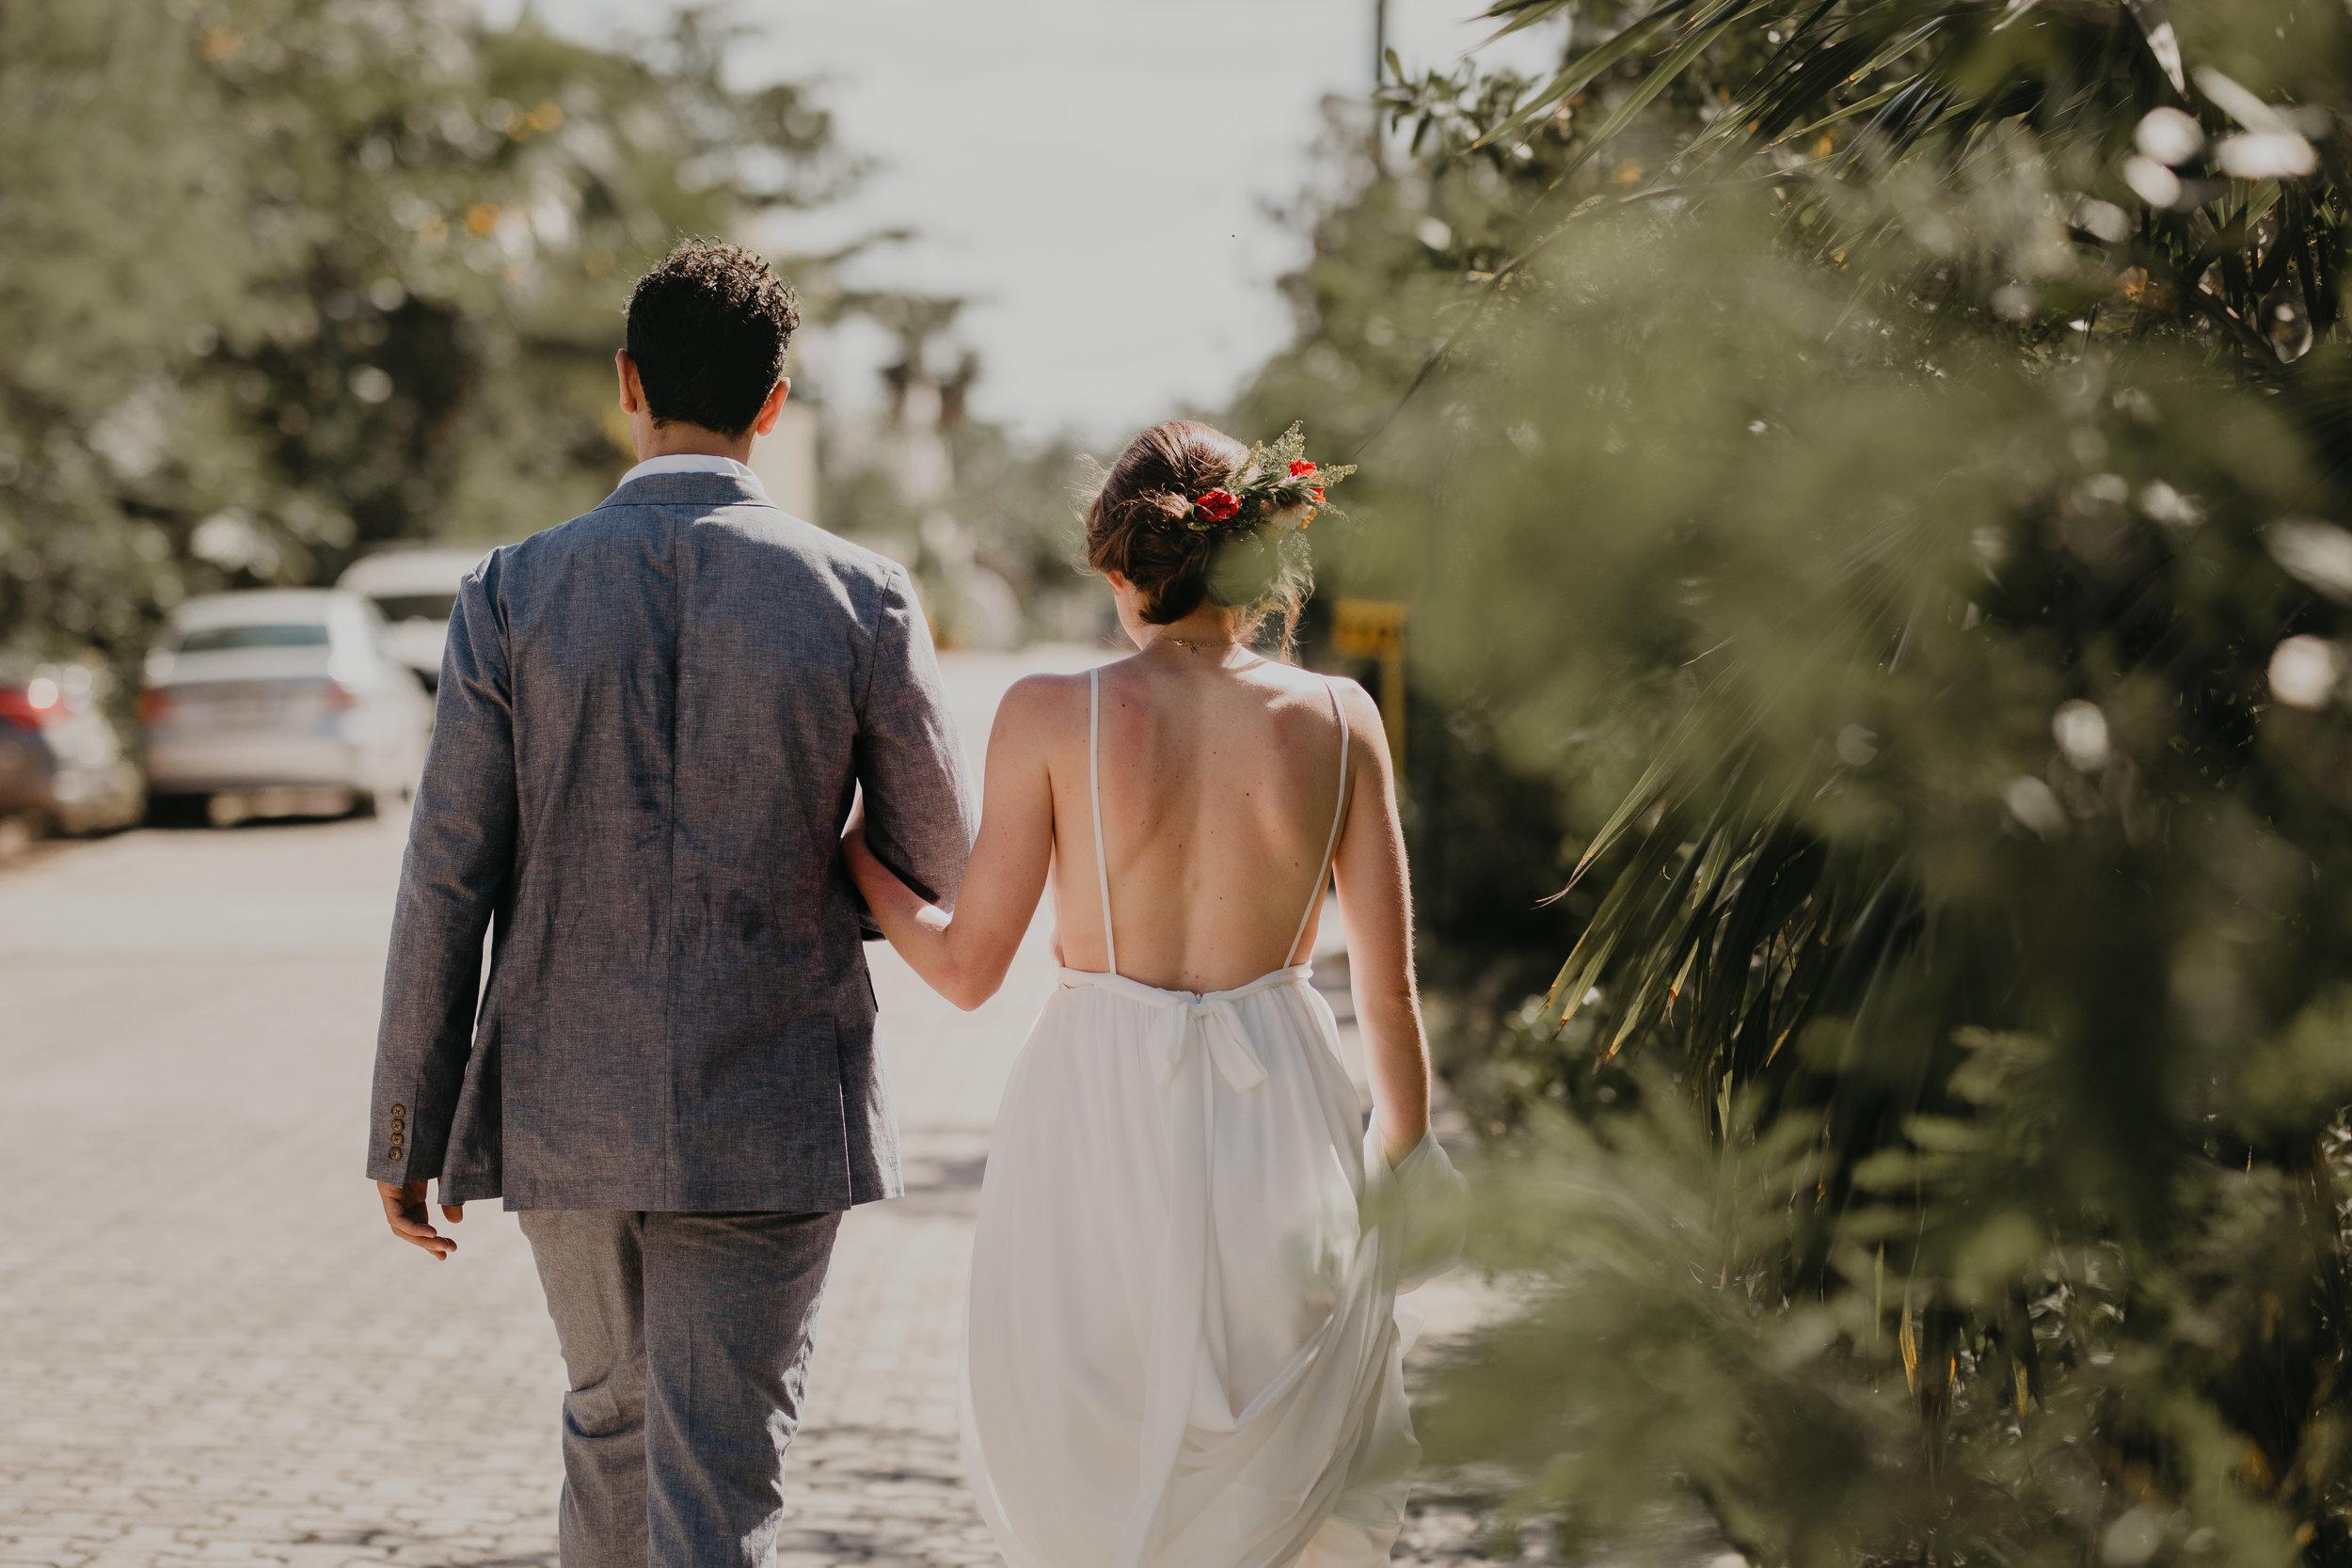 Nicole-Daacke-Photography-beachfront-akumal-destionation-wedding-tulum-mexico-elopement-photographer-destination-wedding-inspiration-sunset-champagne-pop-boho-bride-ocean-tropical-bohemian-tulum-wedding-photos-127.jpg